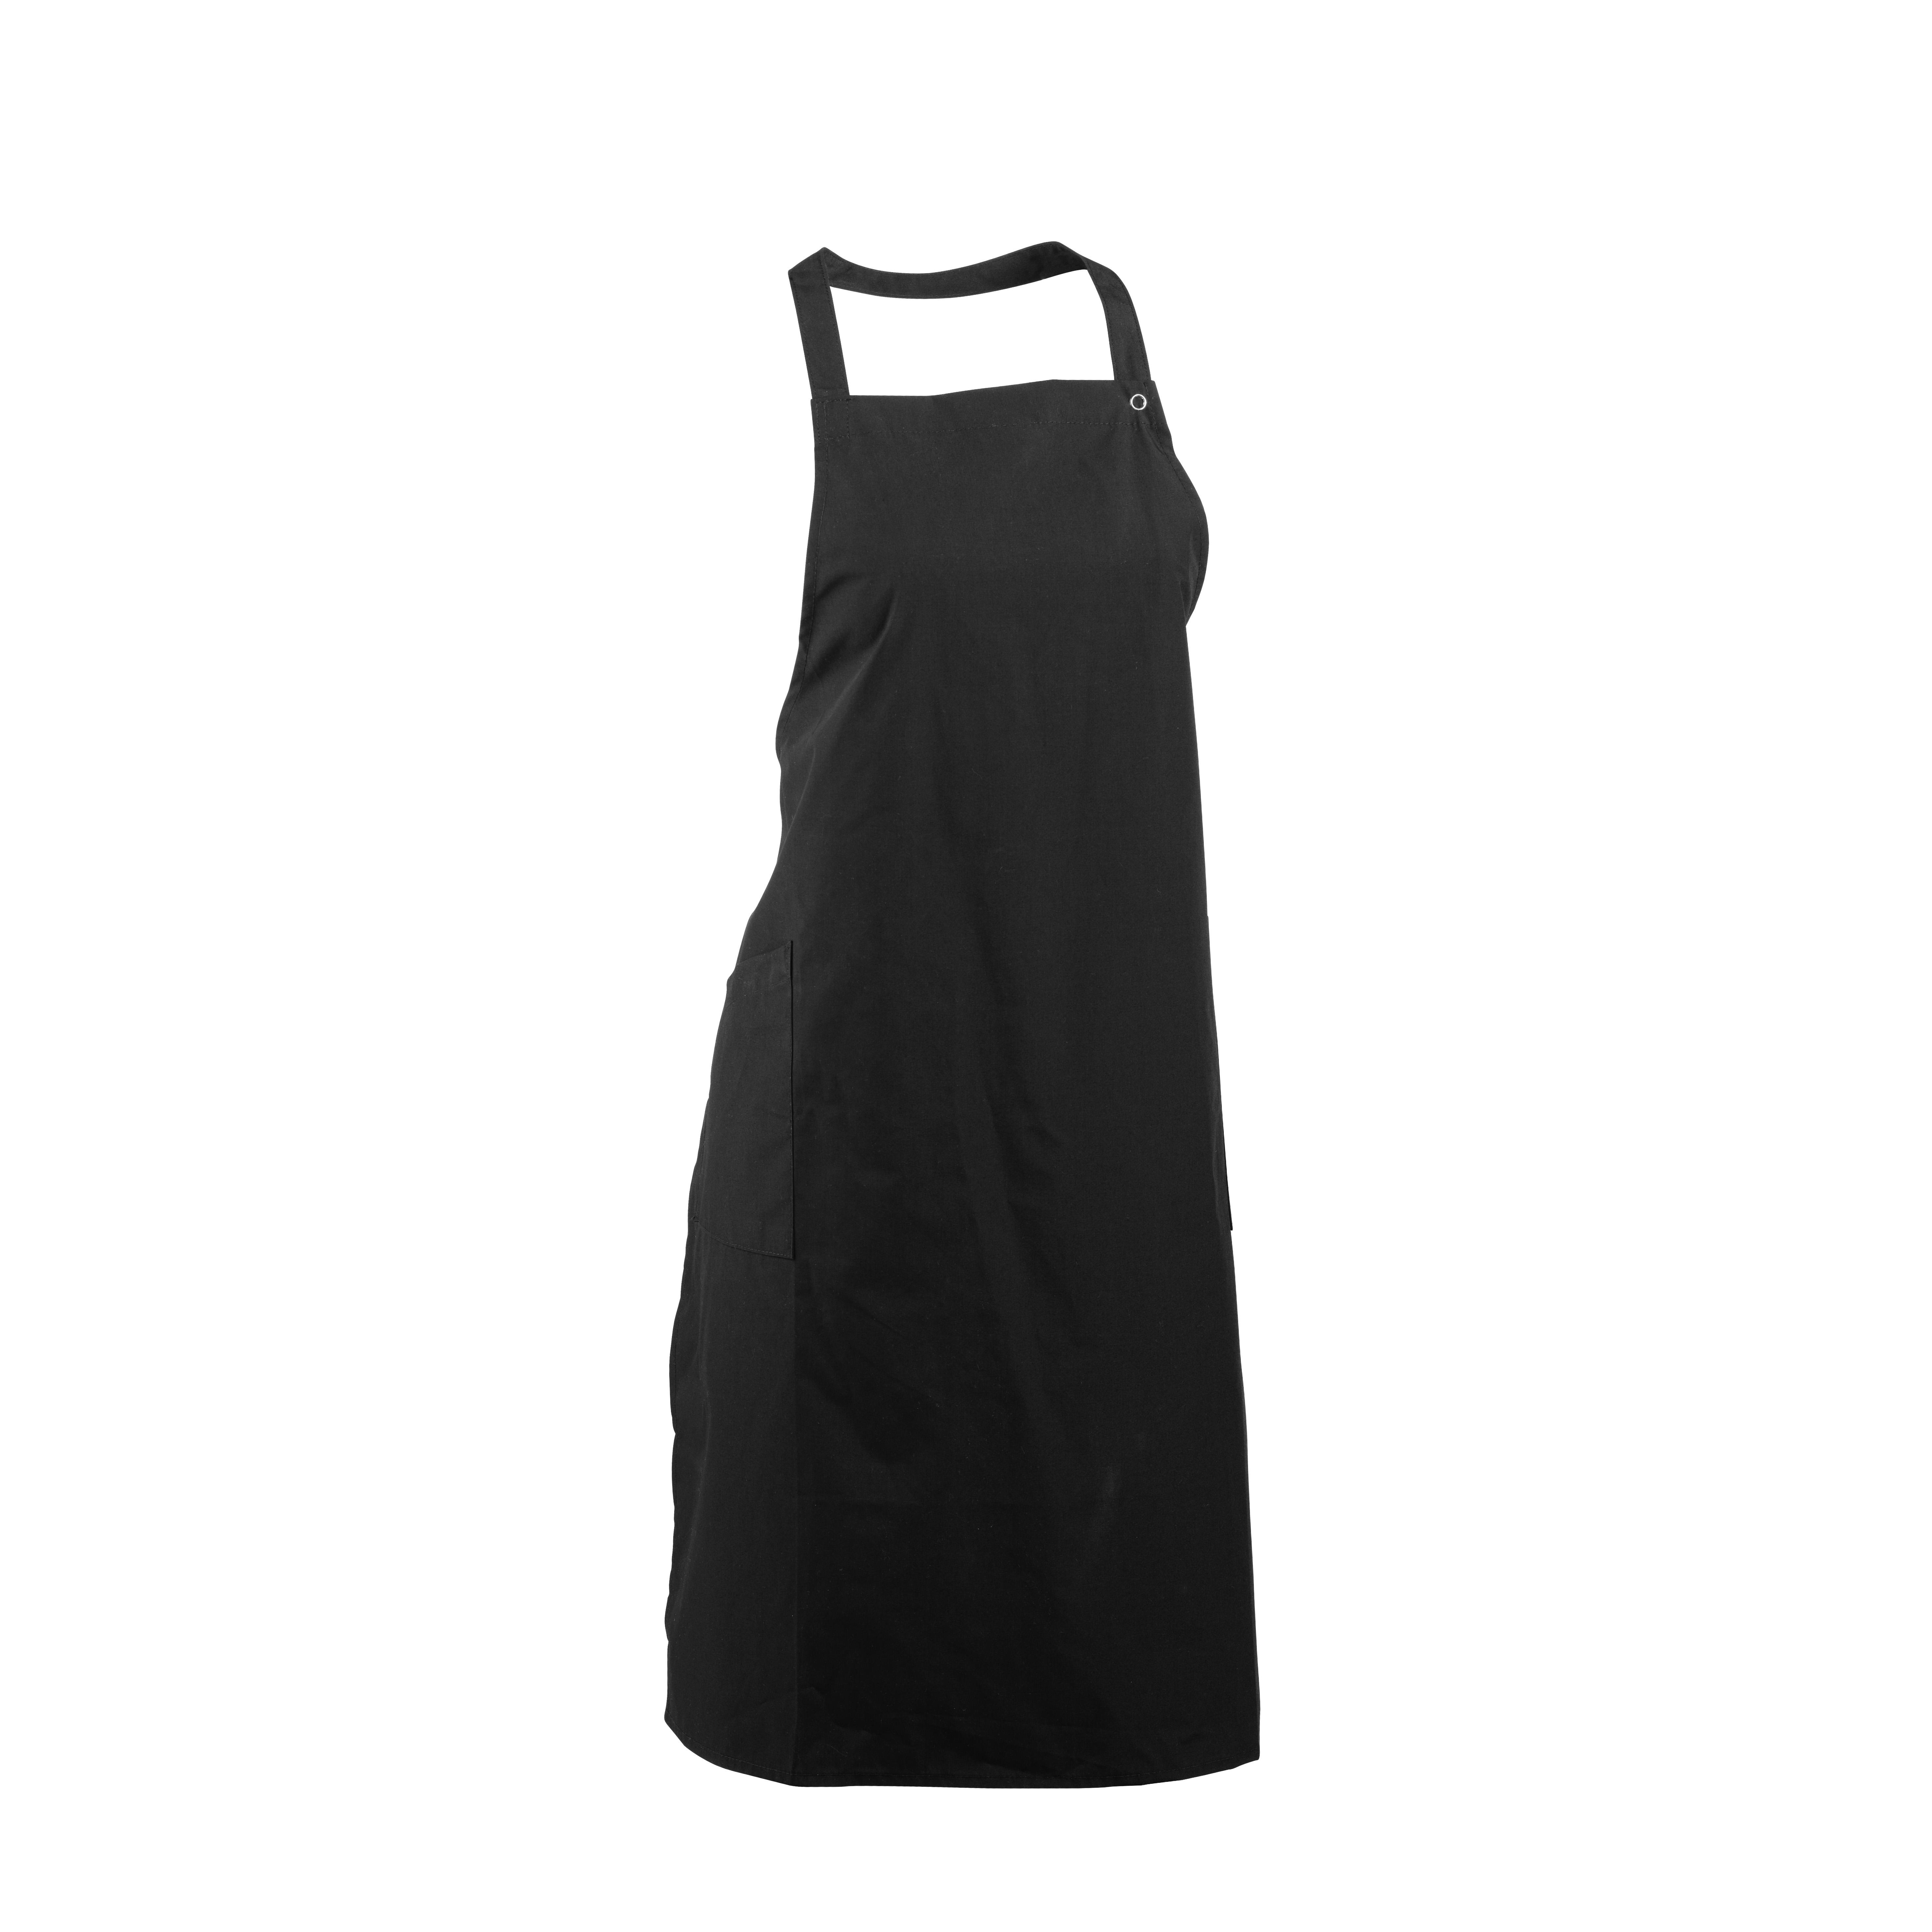 Wako Clean apron 5830 - kadernícka zástera